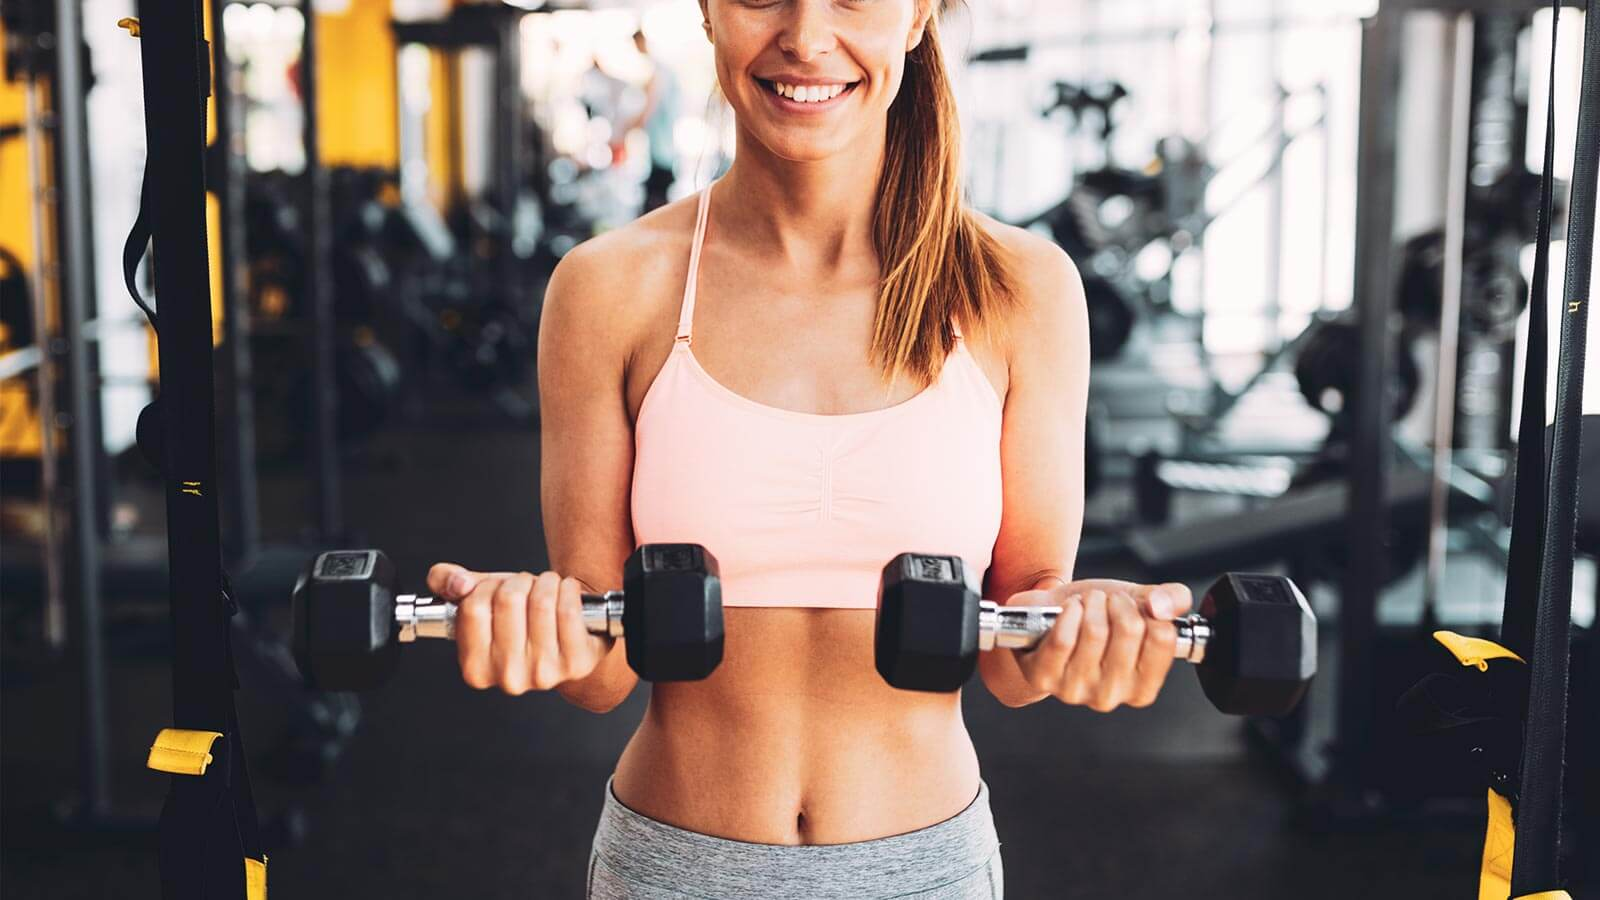 miction fatigue perte de poids va sasseoir perdre du poids